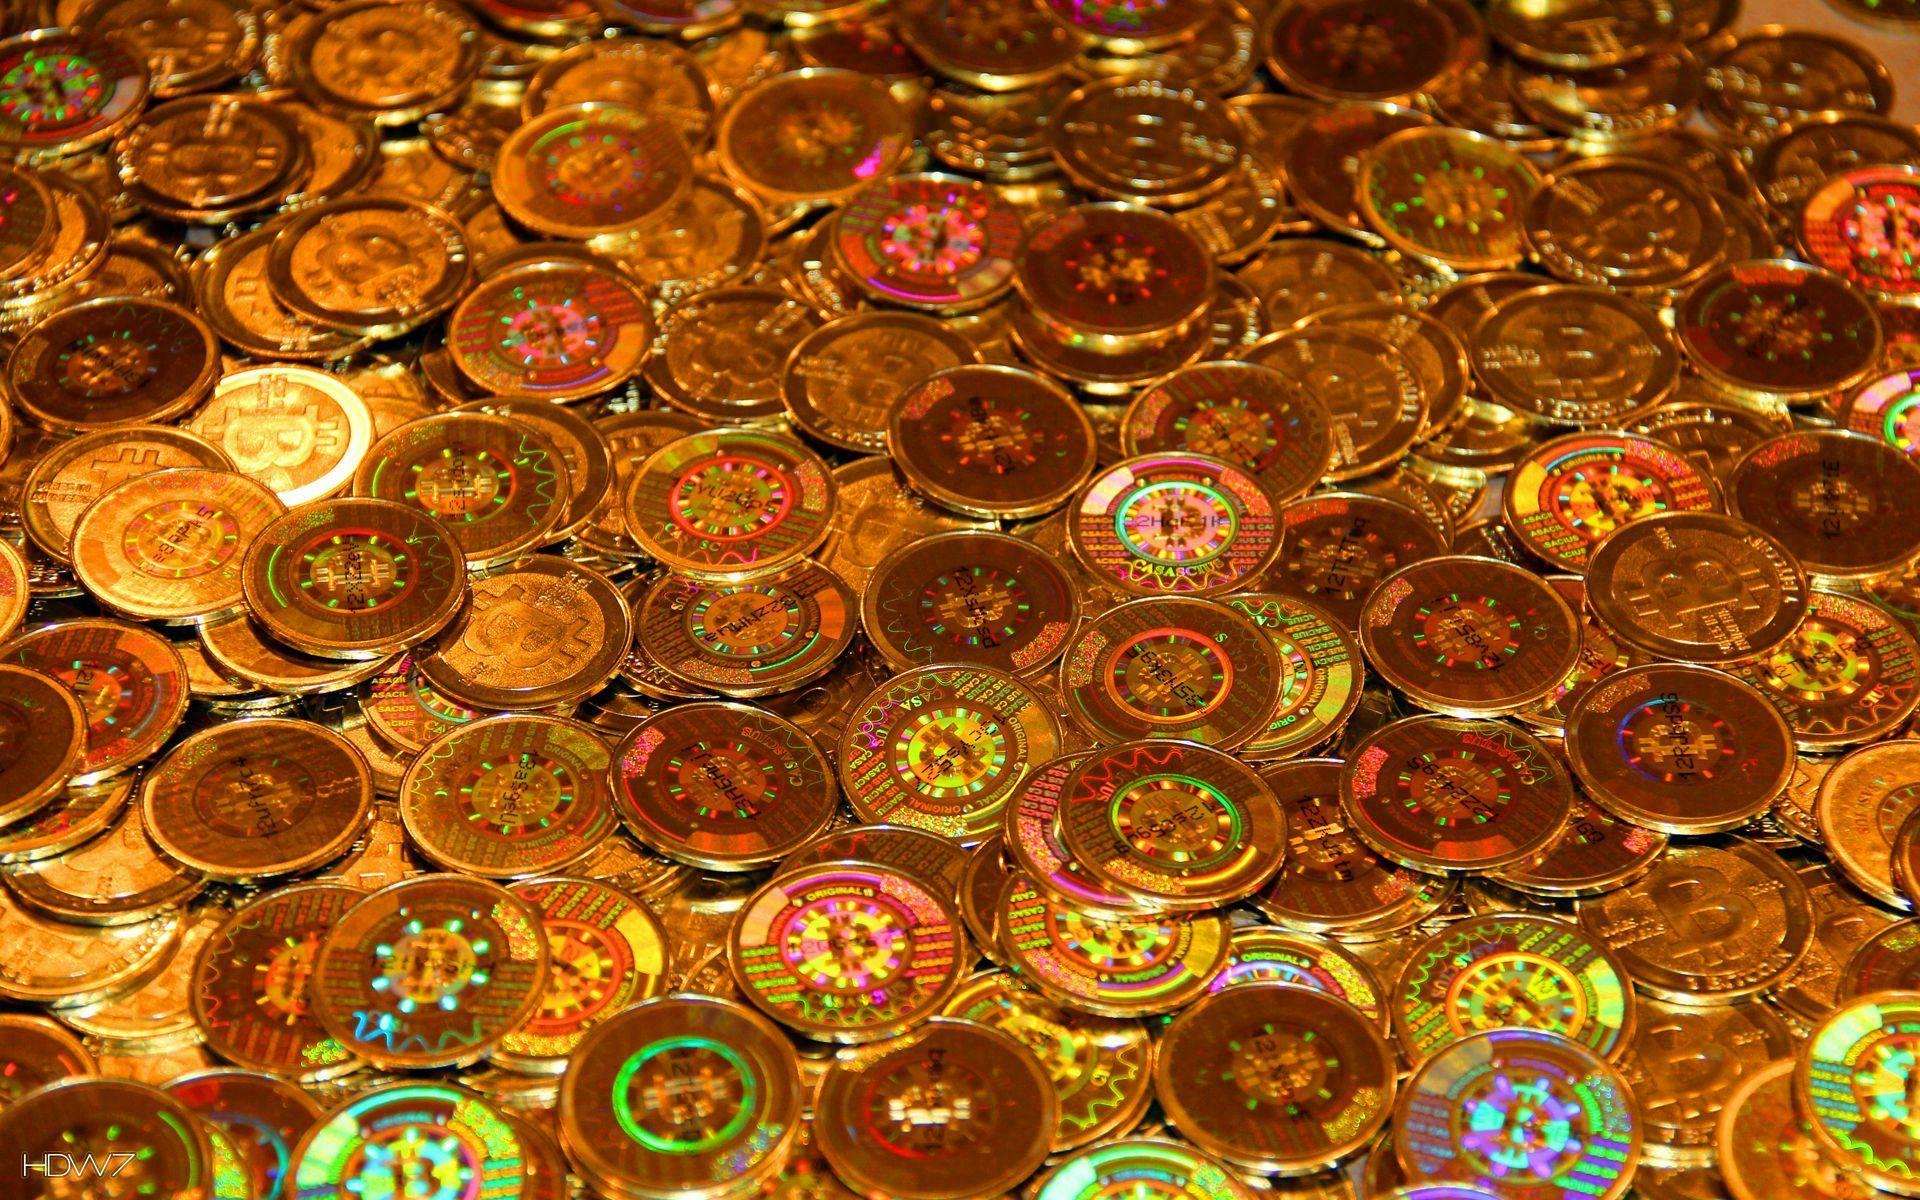 shiny-bitcoin-coins-money-wallpaper-hd-money